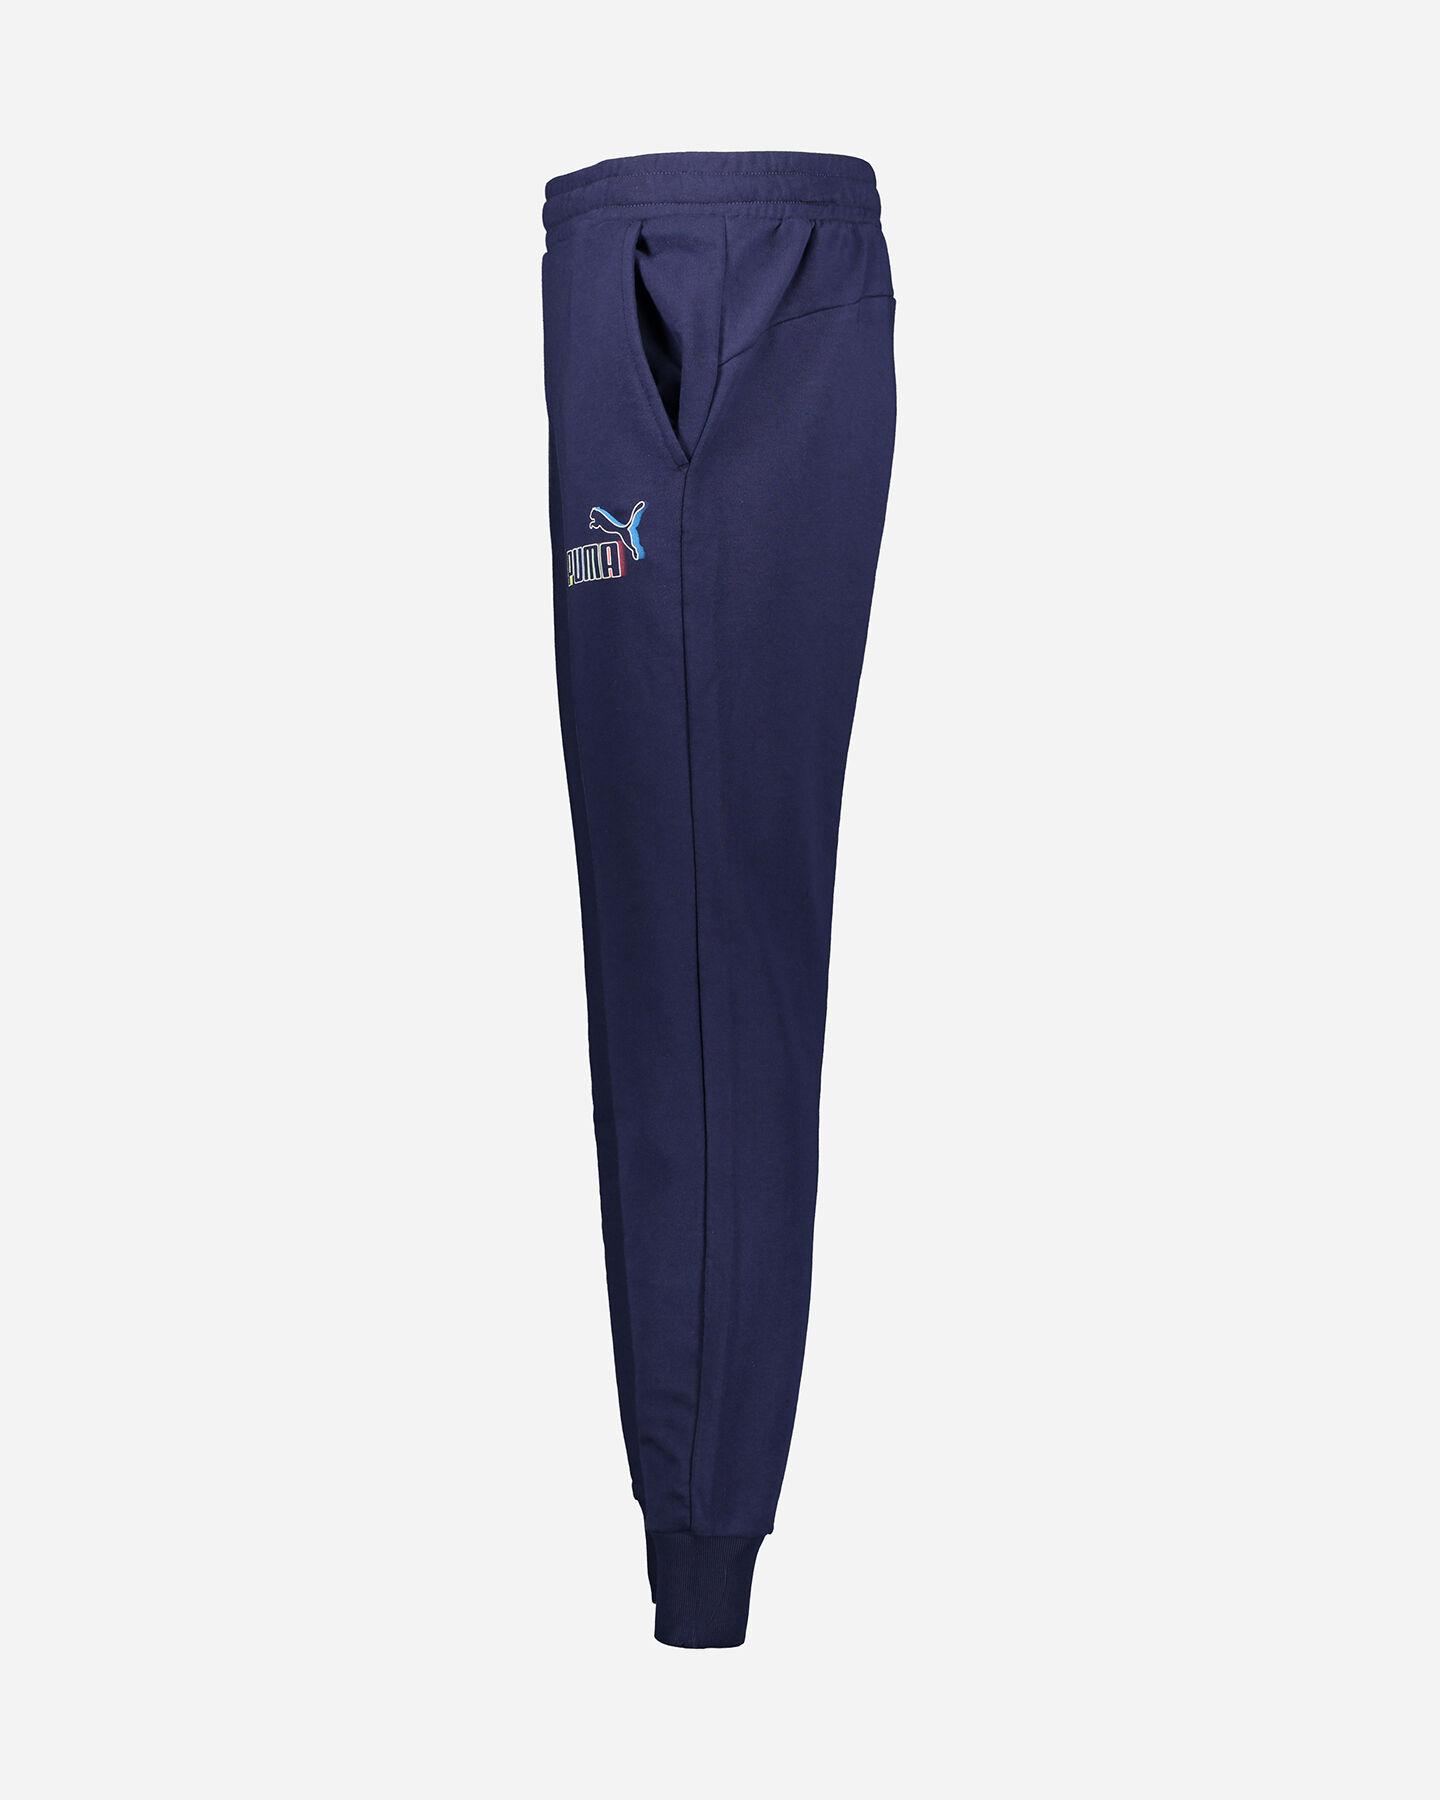 Pantalone PUMA CORE BLANK BASE CLOSED M S5339790 scatto 1